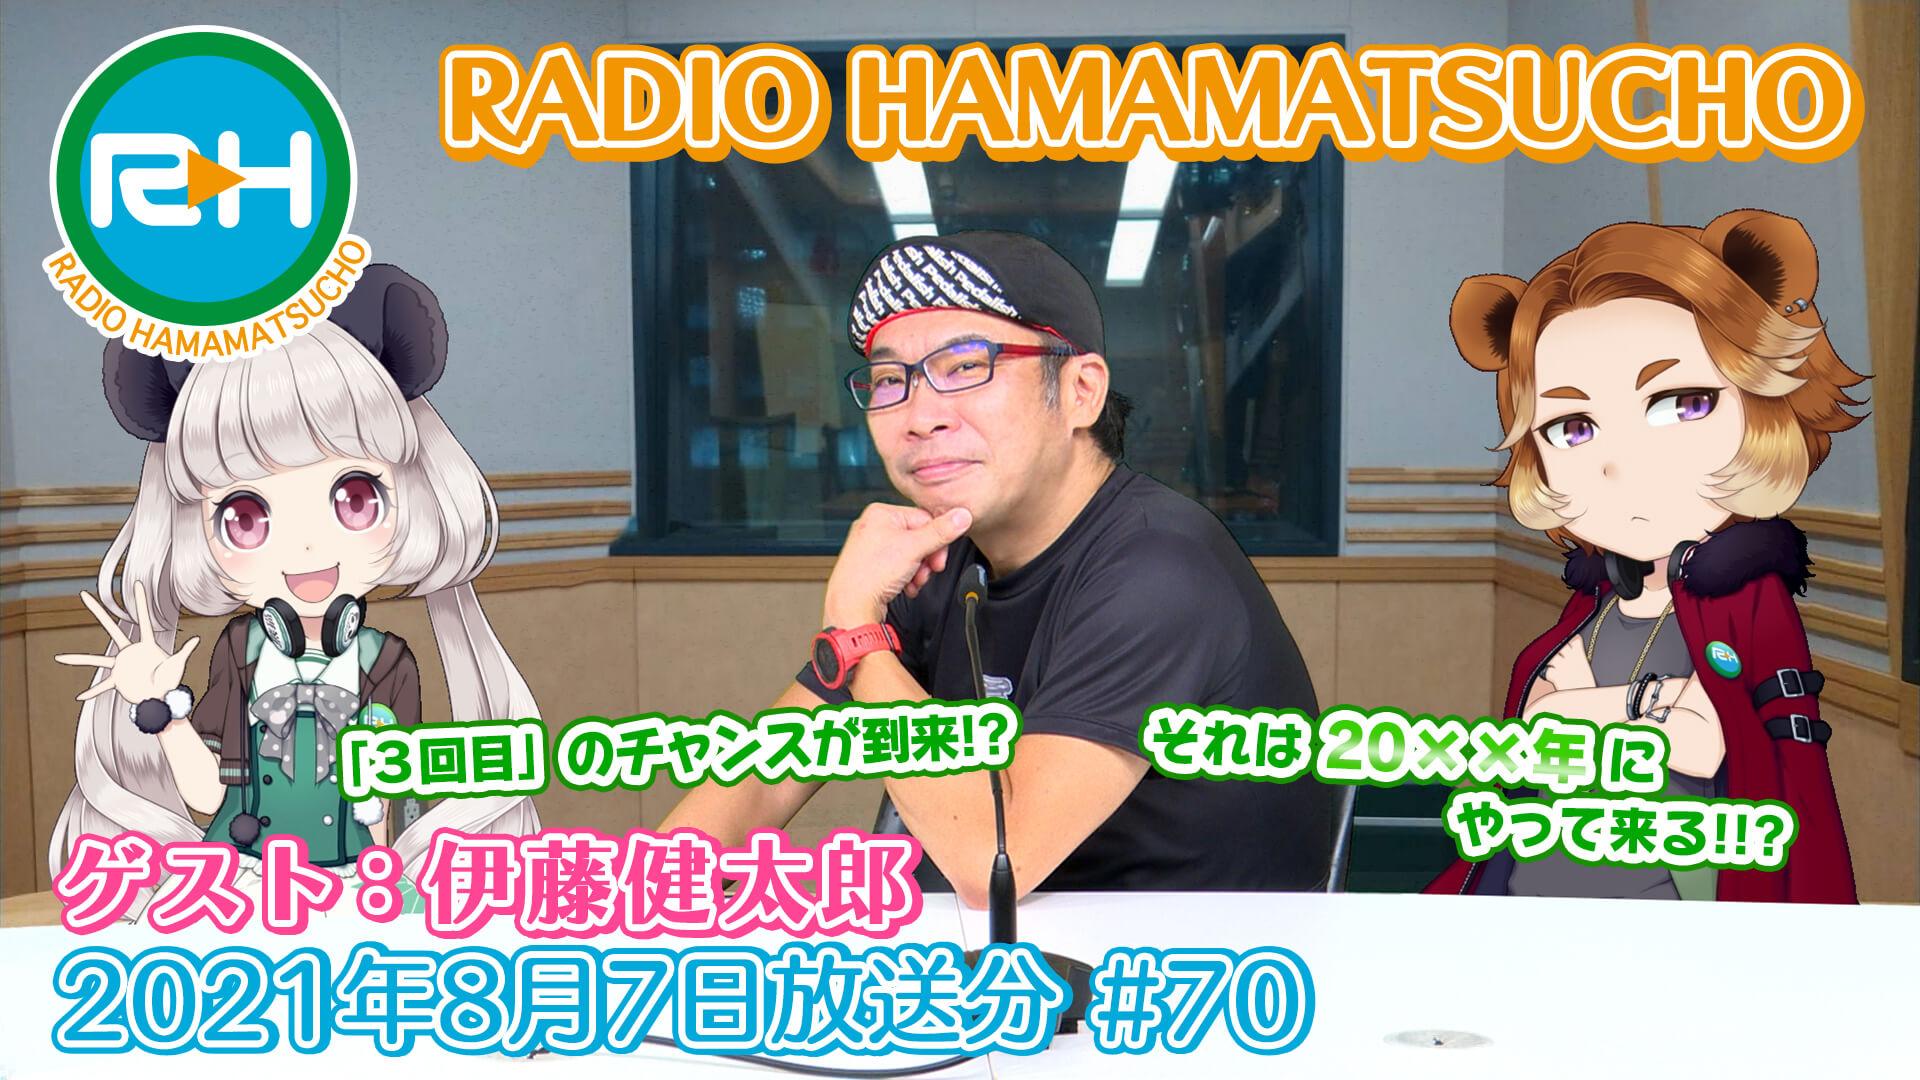 RADIO HAMAMATSUCHO 第70回 (2021年8月7日放送分) ゲスト: 伊藤健太郎